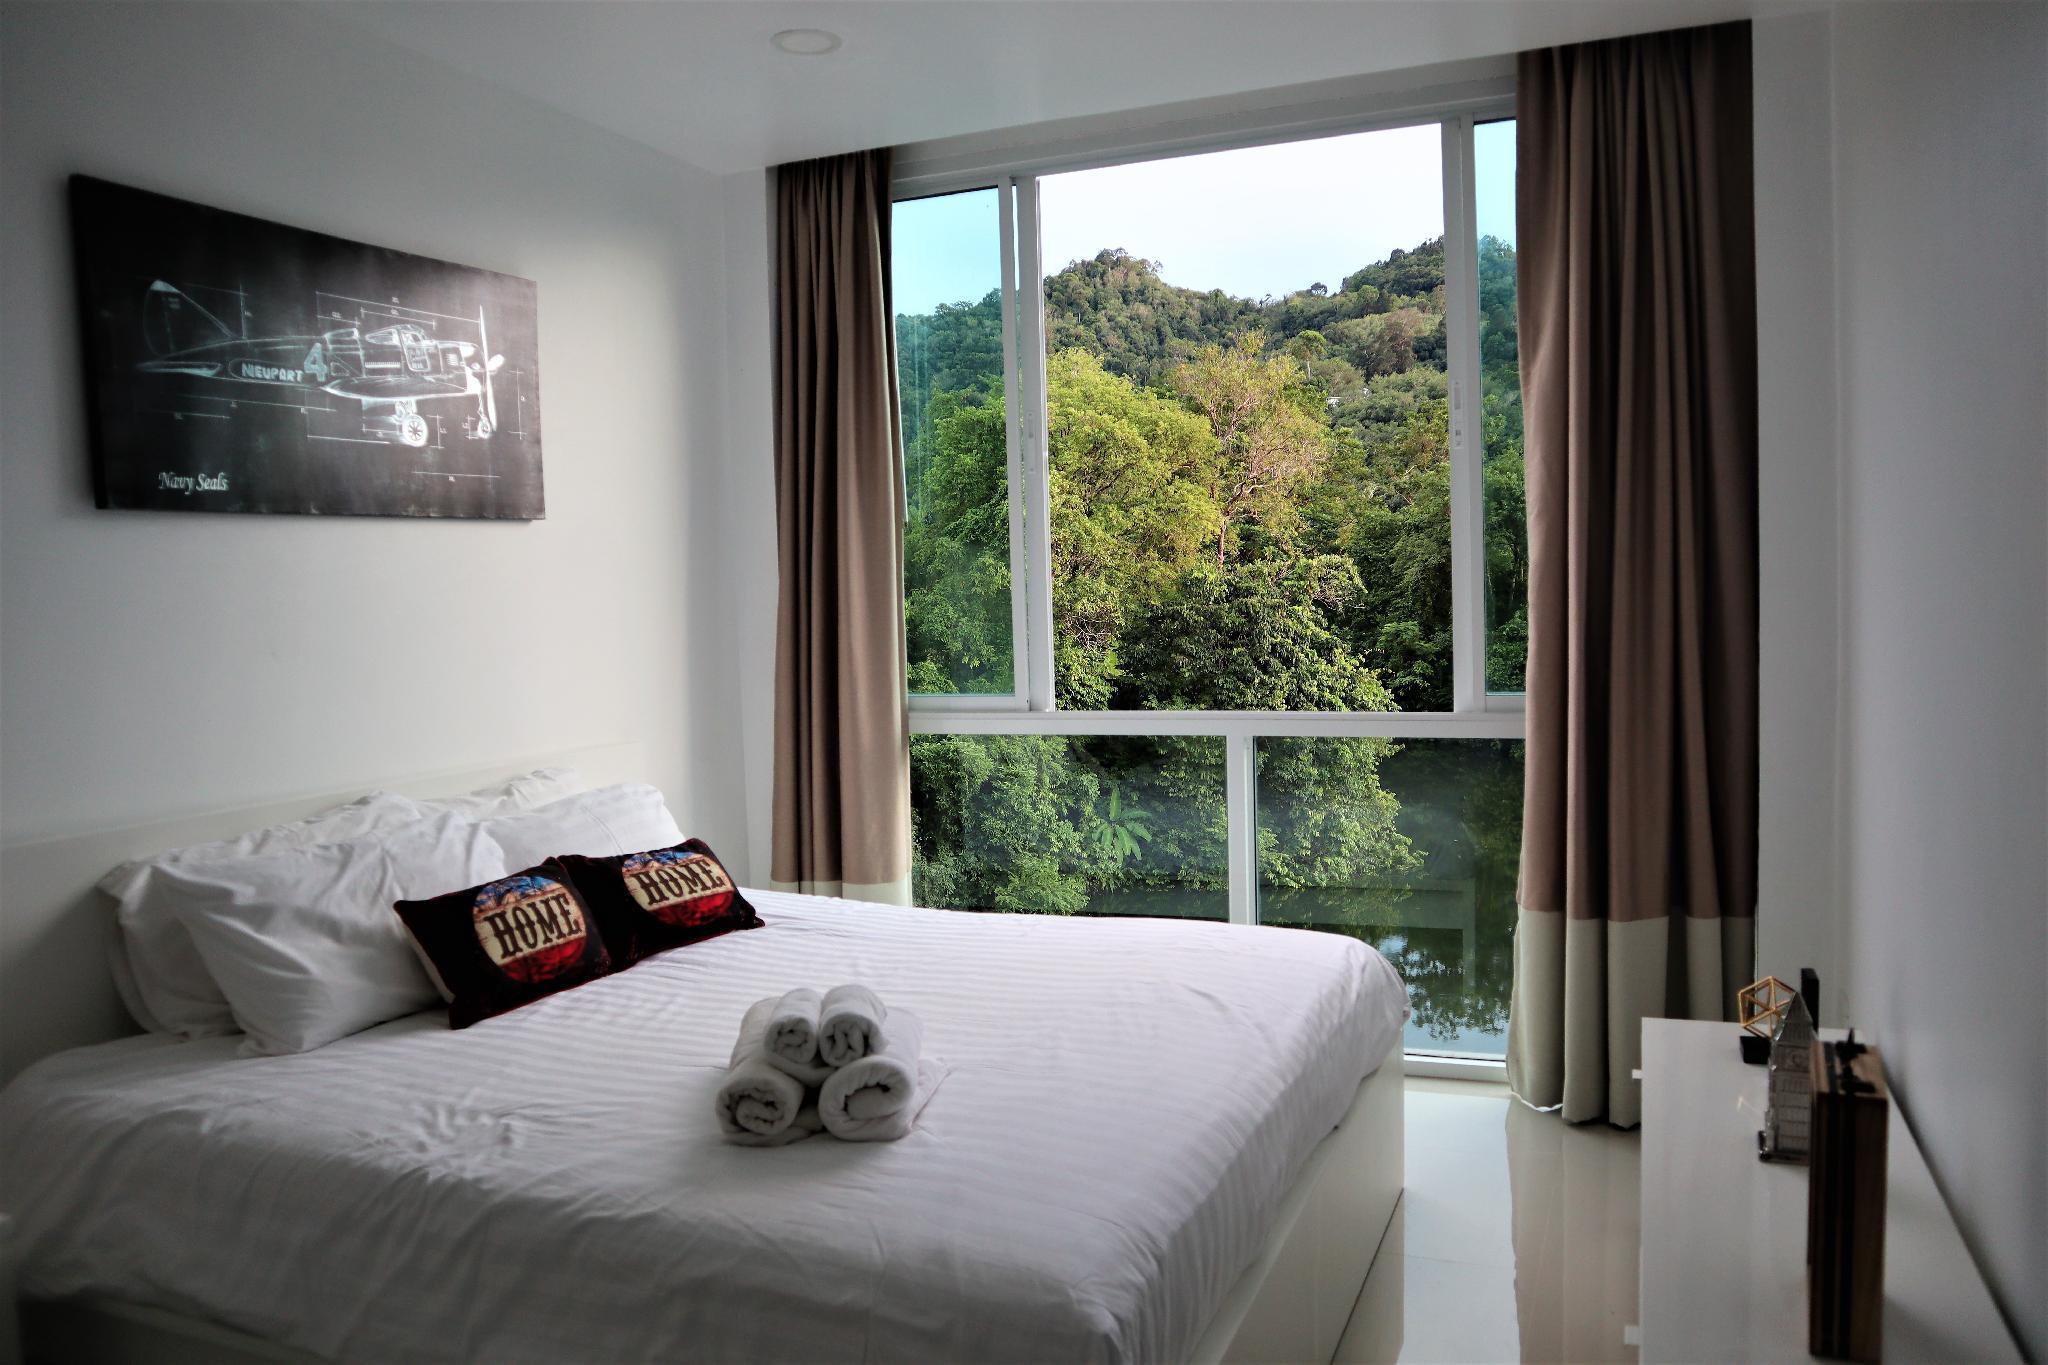 2 bedroom condo with pool and lake view unit 4 อพาร์ตเมนต์ 2 ห้องนอน 1 ห้องน้ำส่วนตัว ขนาด 57 ตร.ม. – กมลา